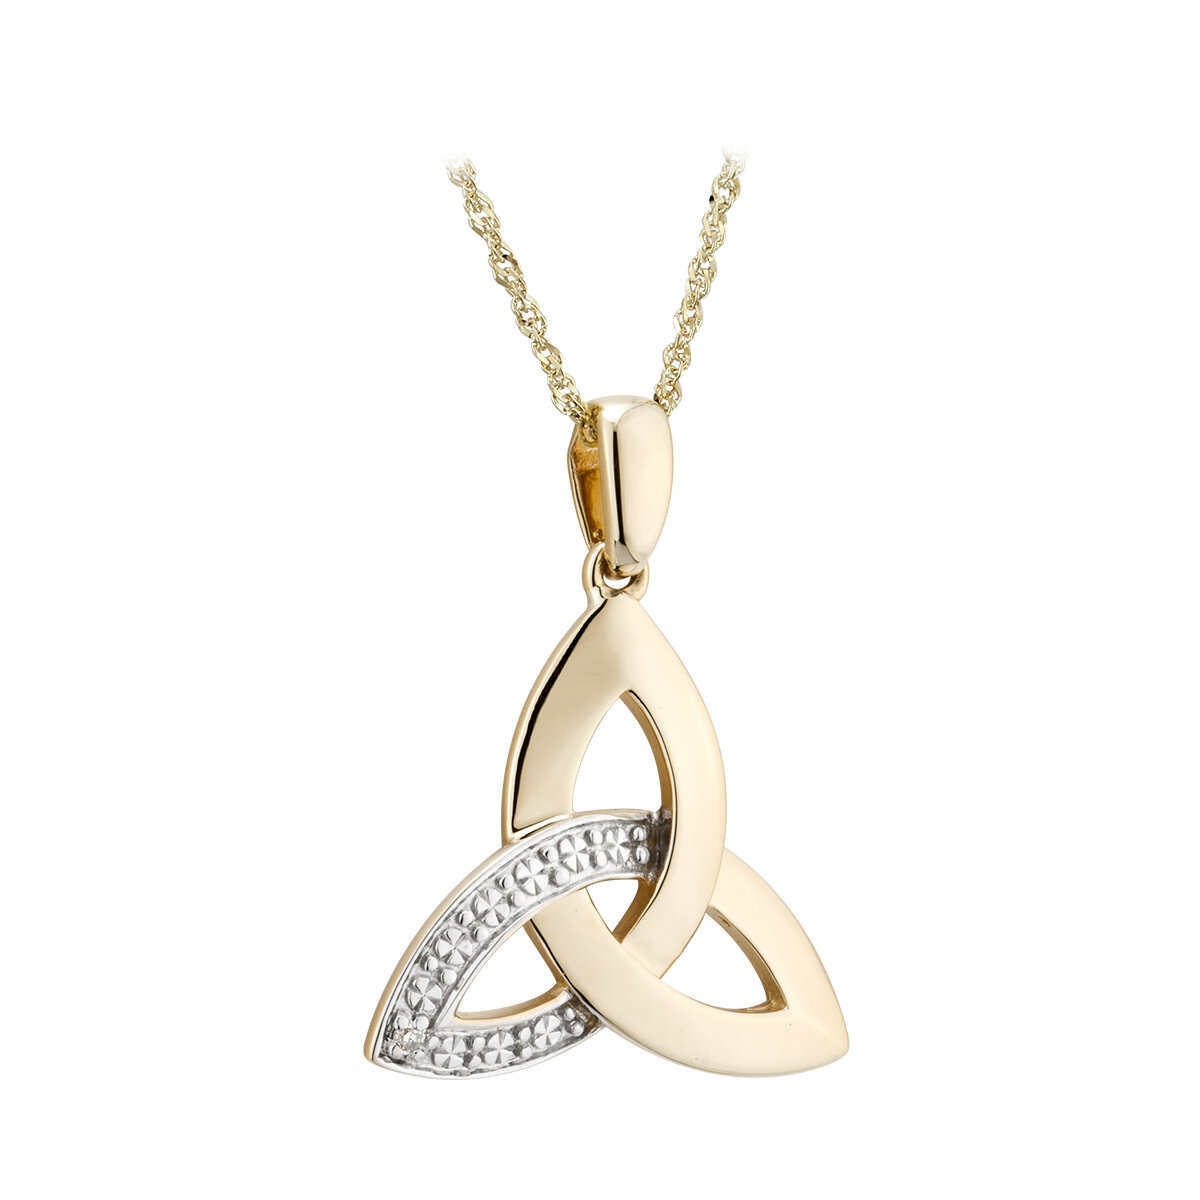 10k gold diamond trinity knot pendant s46517 from Solvar